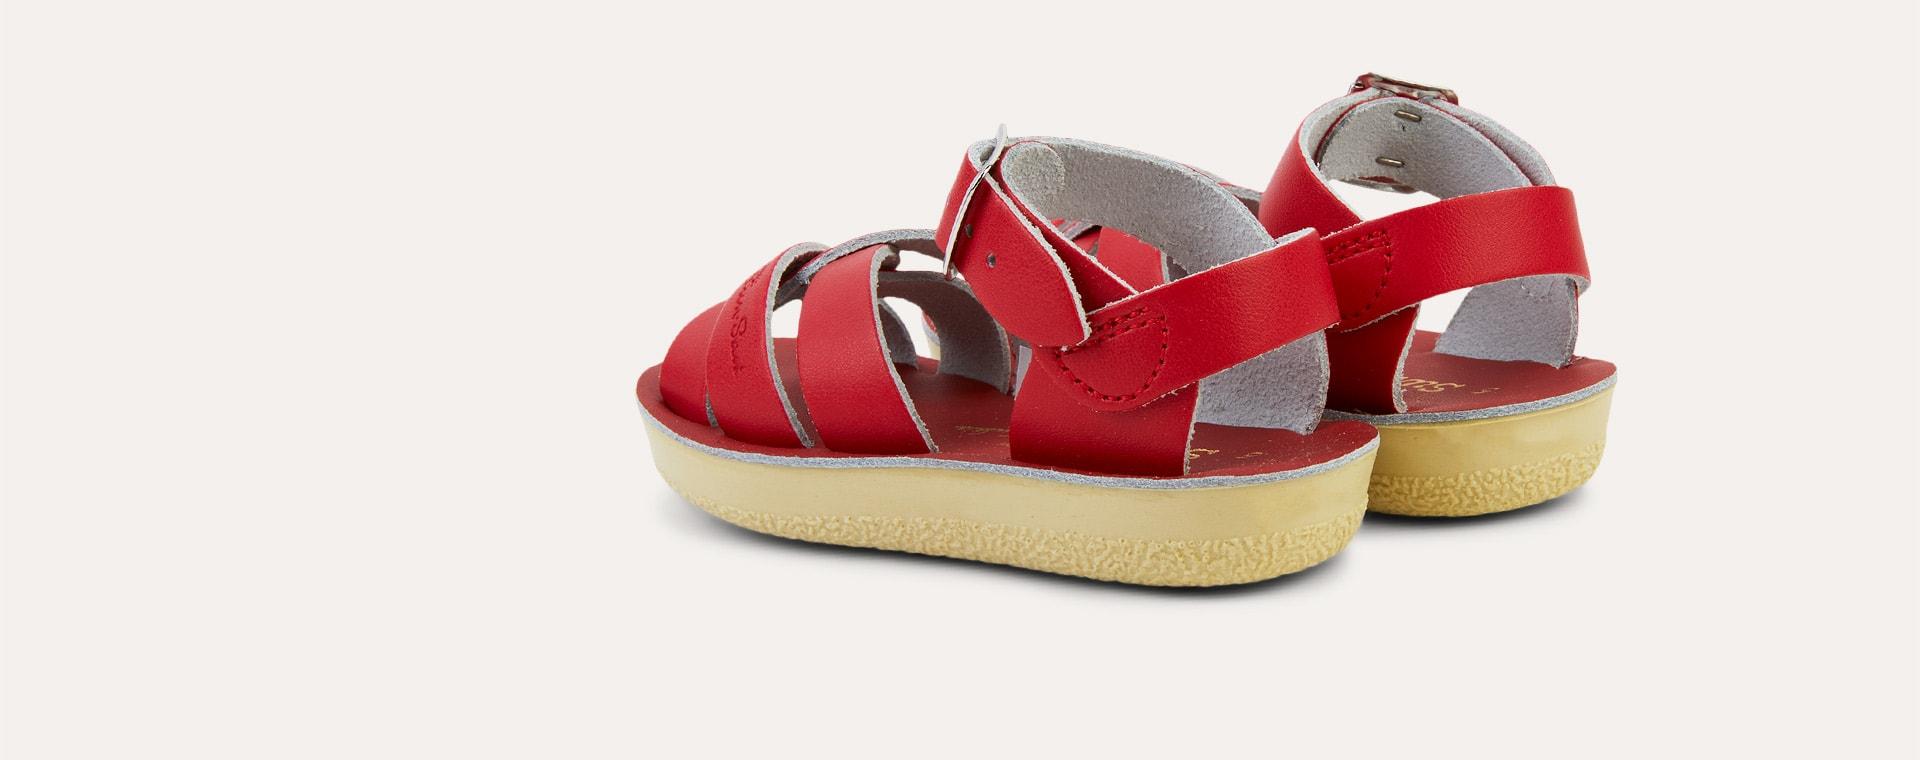 Red Salt-Water Sandals Swimmer Sandal